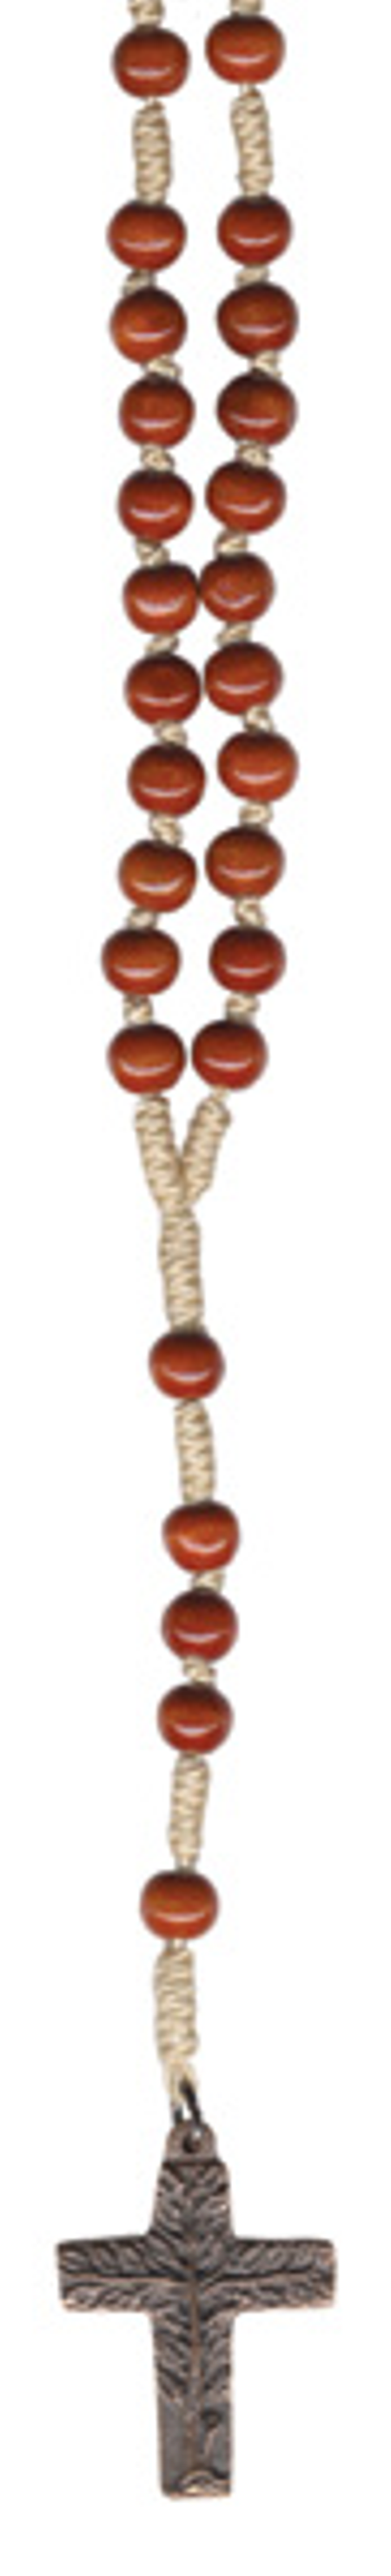 ROZENKRANS - bruin - grote parel - brons kruis - levensboom - 46 cm